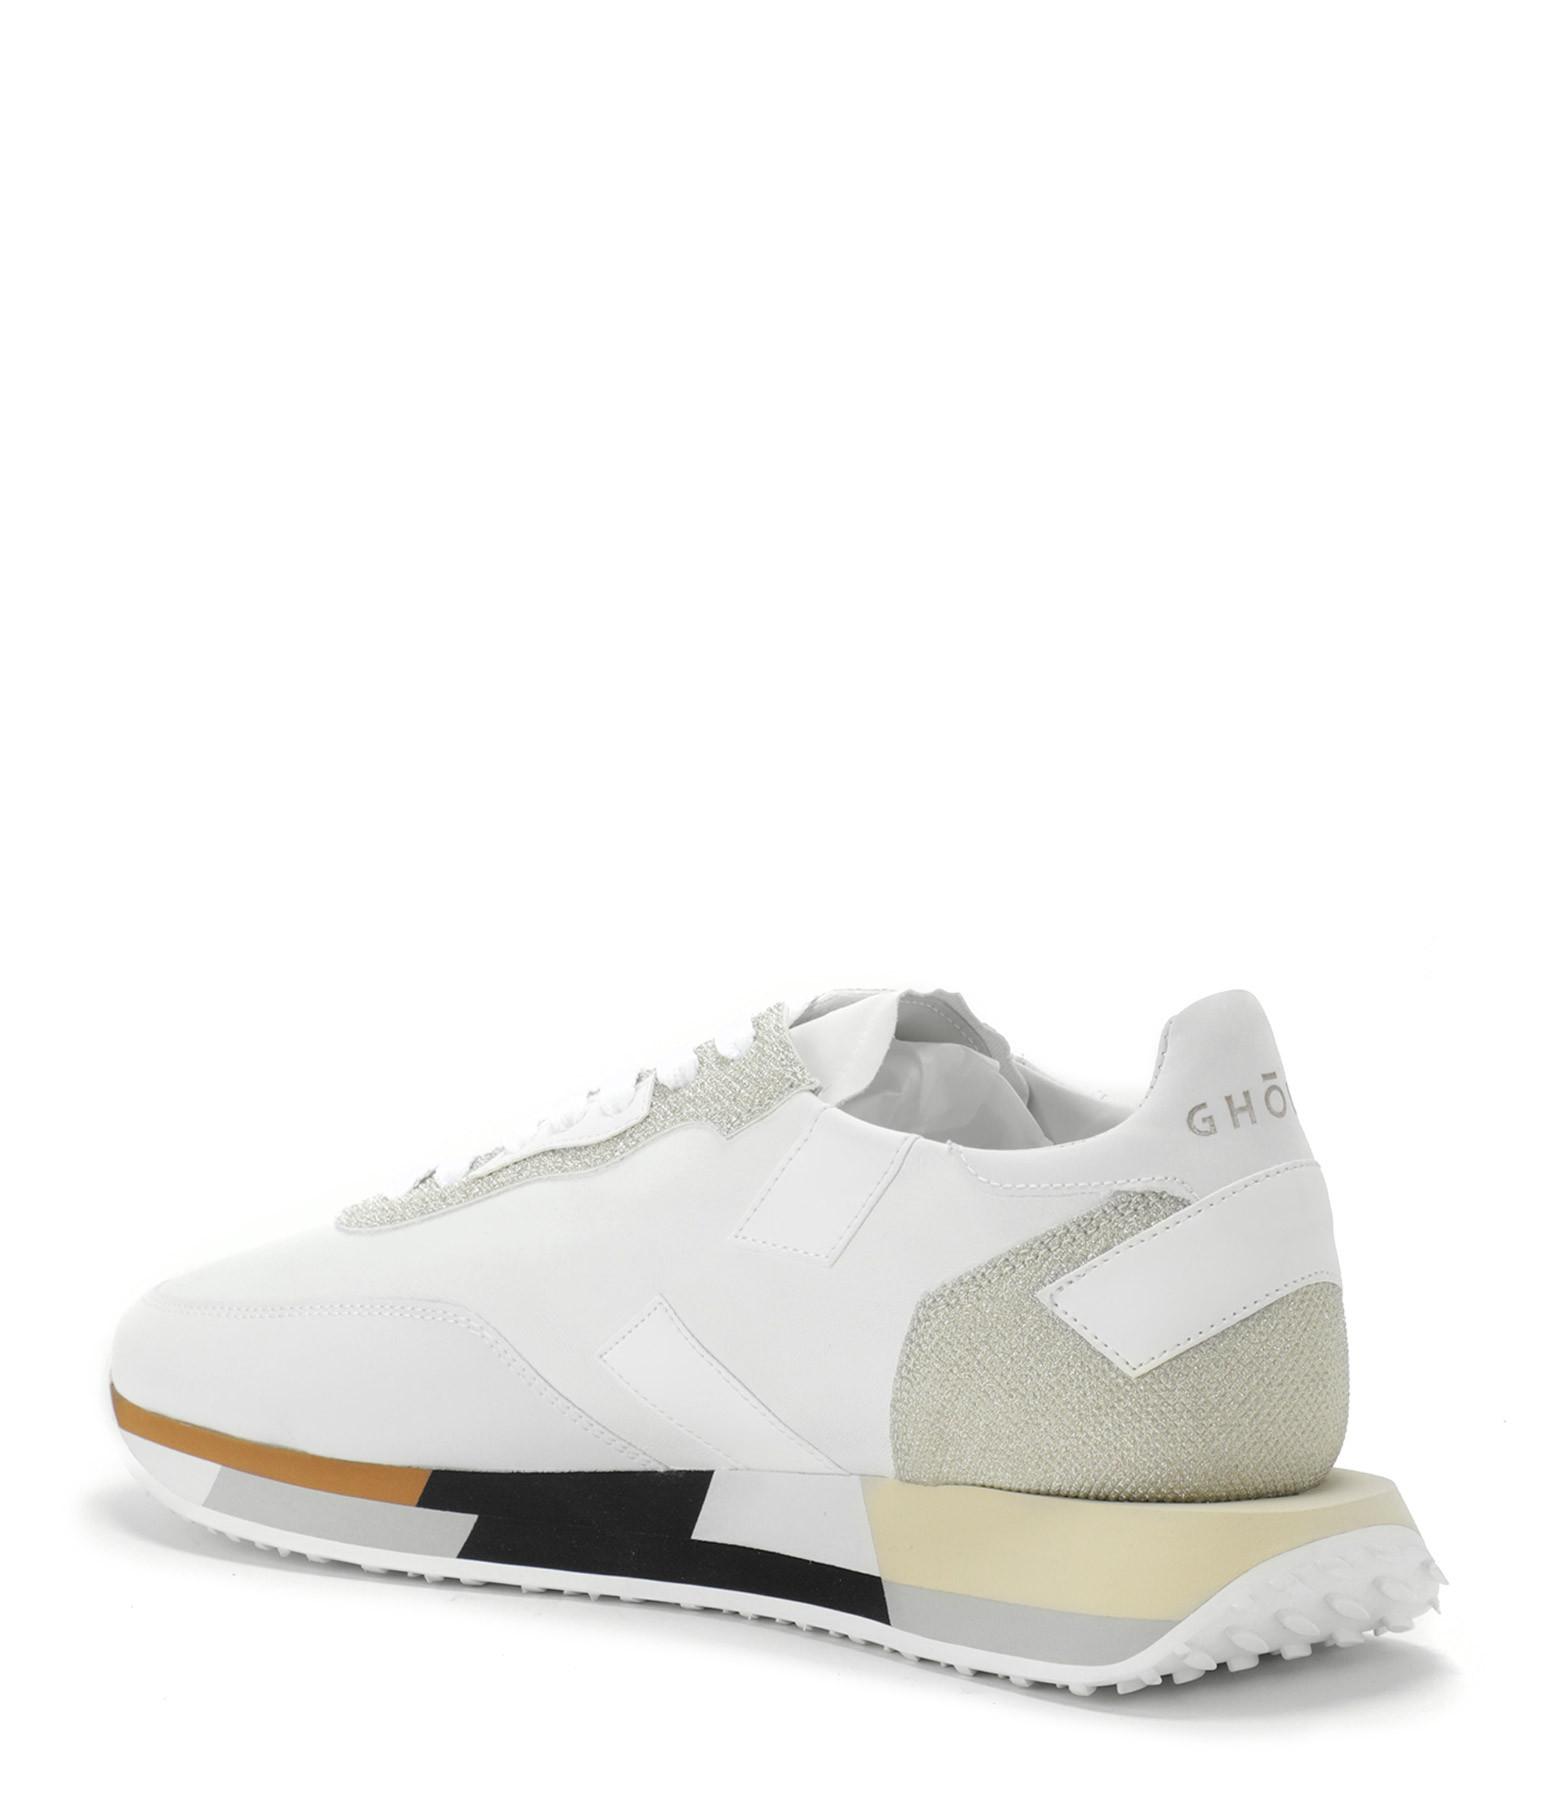 GHOUD VENICE - Baskets Rush Low Cuir Glitter Blanc Platinum